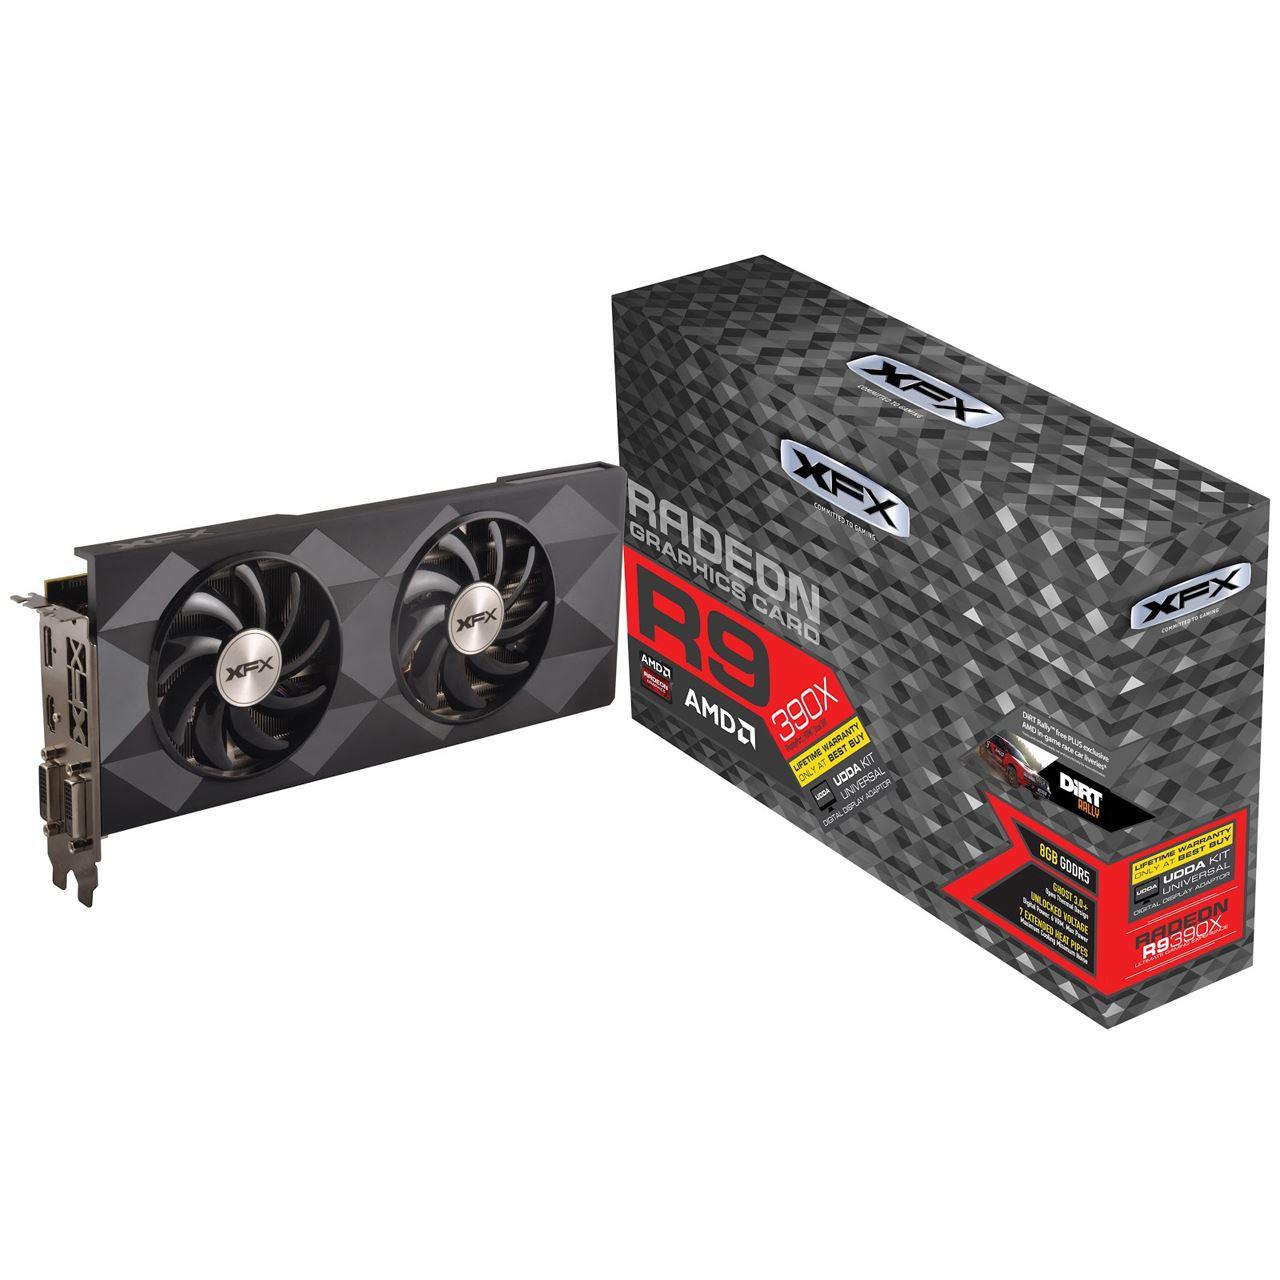 8GB XFX Radeon R9 390X Double Dissipation Edition Aktiv